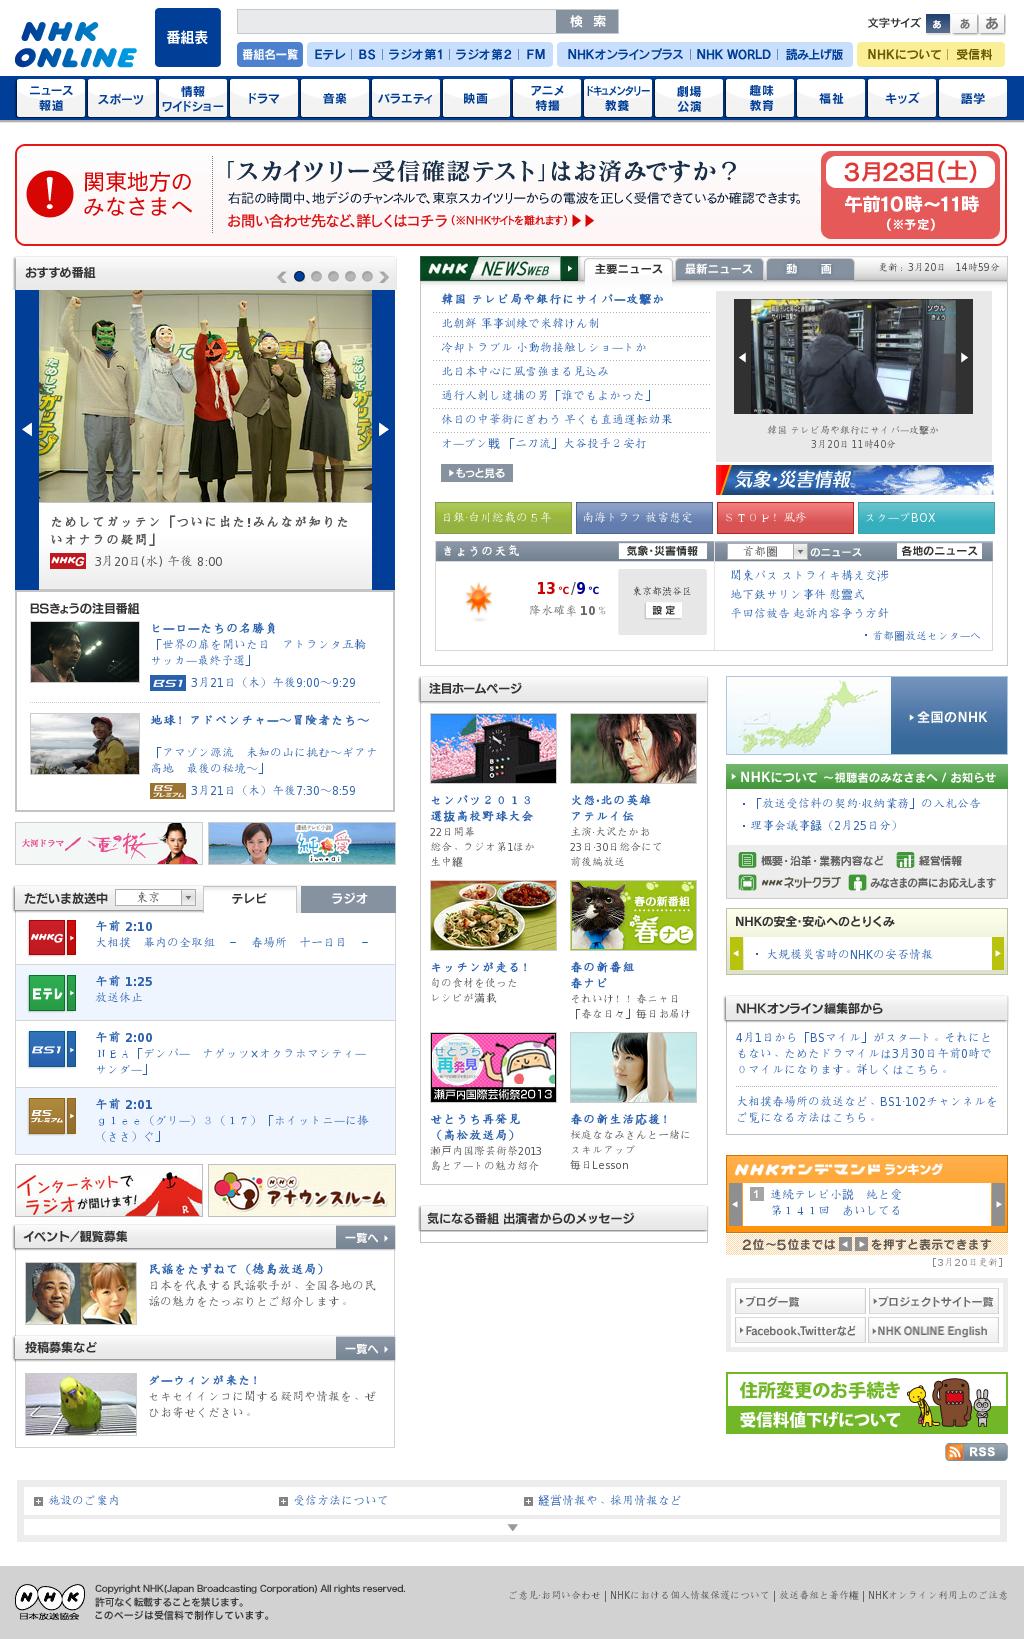 NHK Online at Wednesday March 20, 2013, 5:22 p.m. UTC